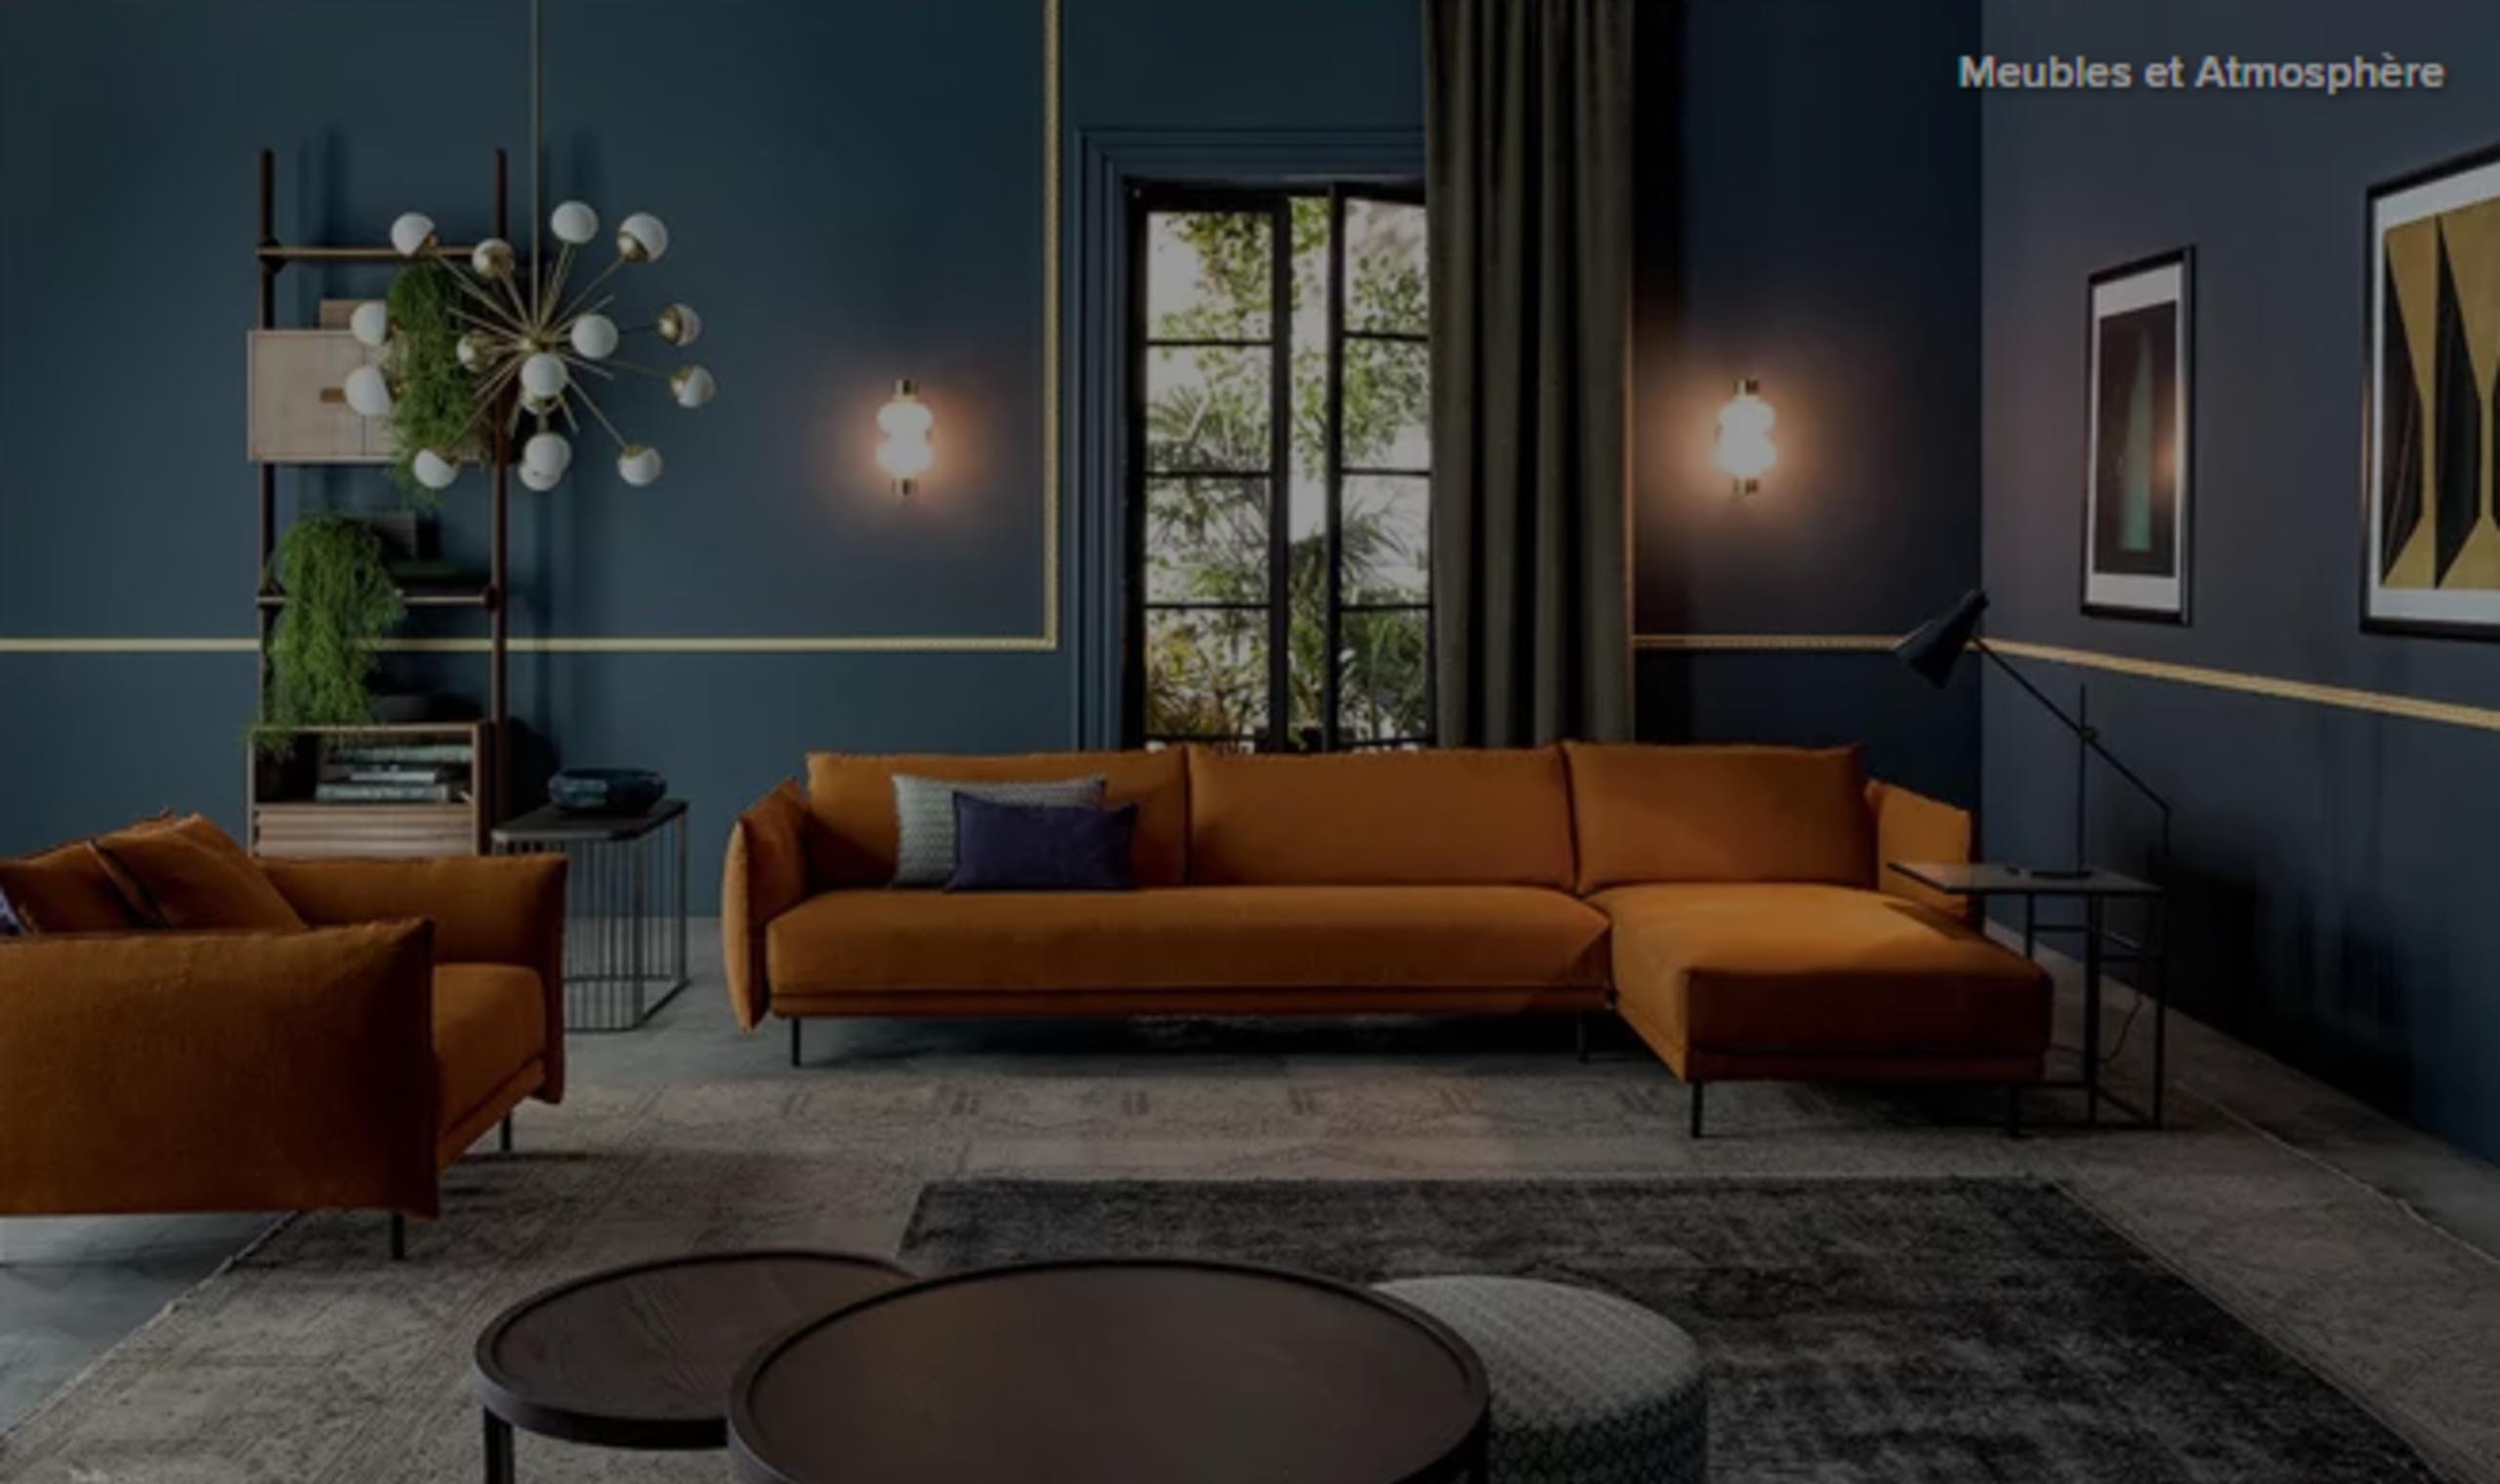 Maison & Objet: 7 Color Trends for 2019